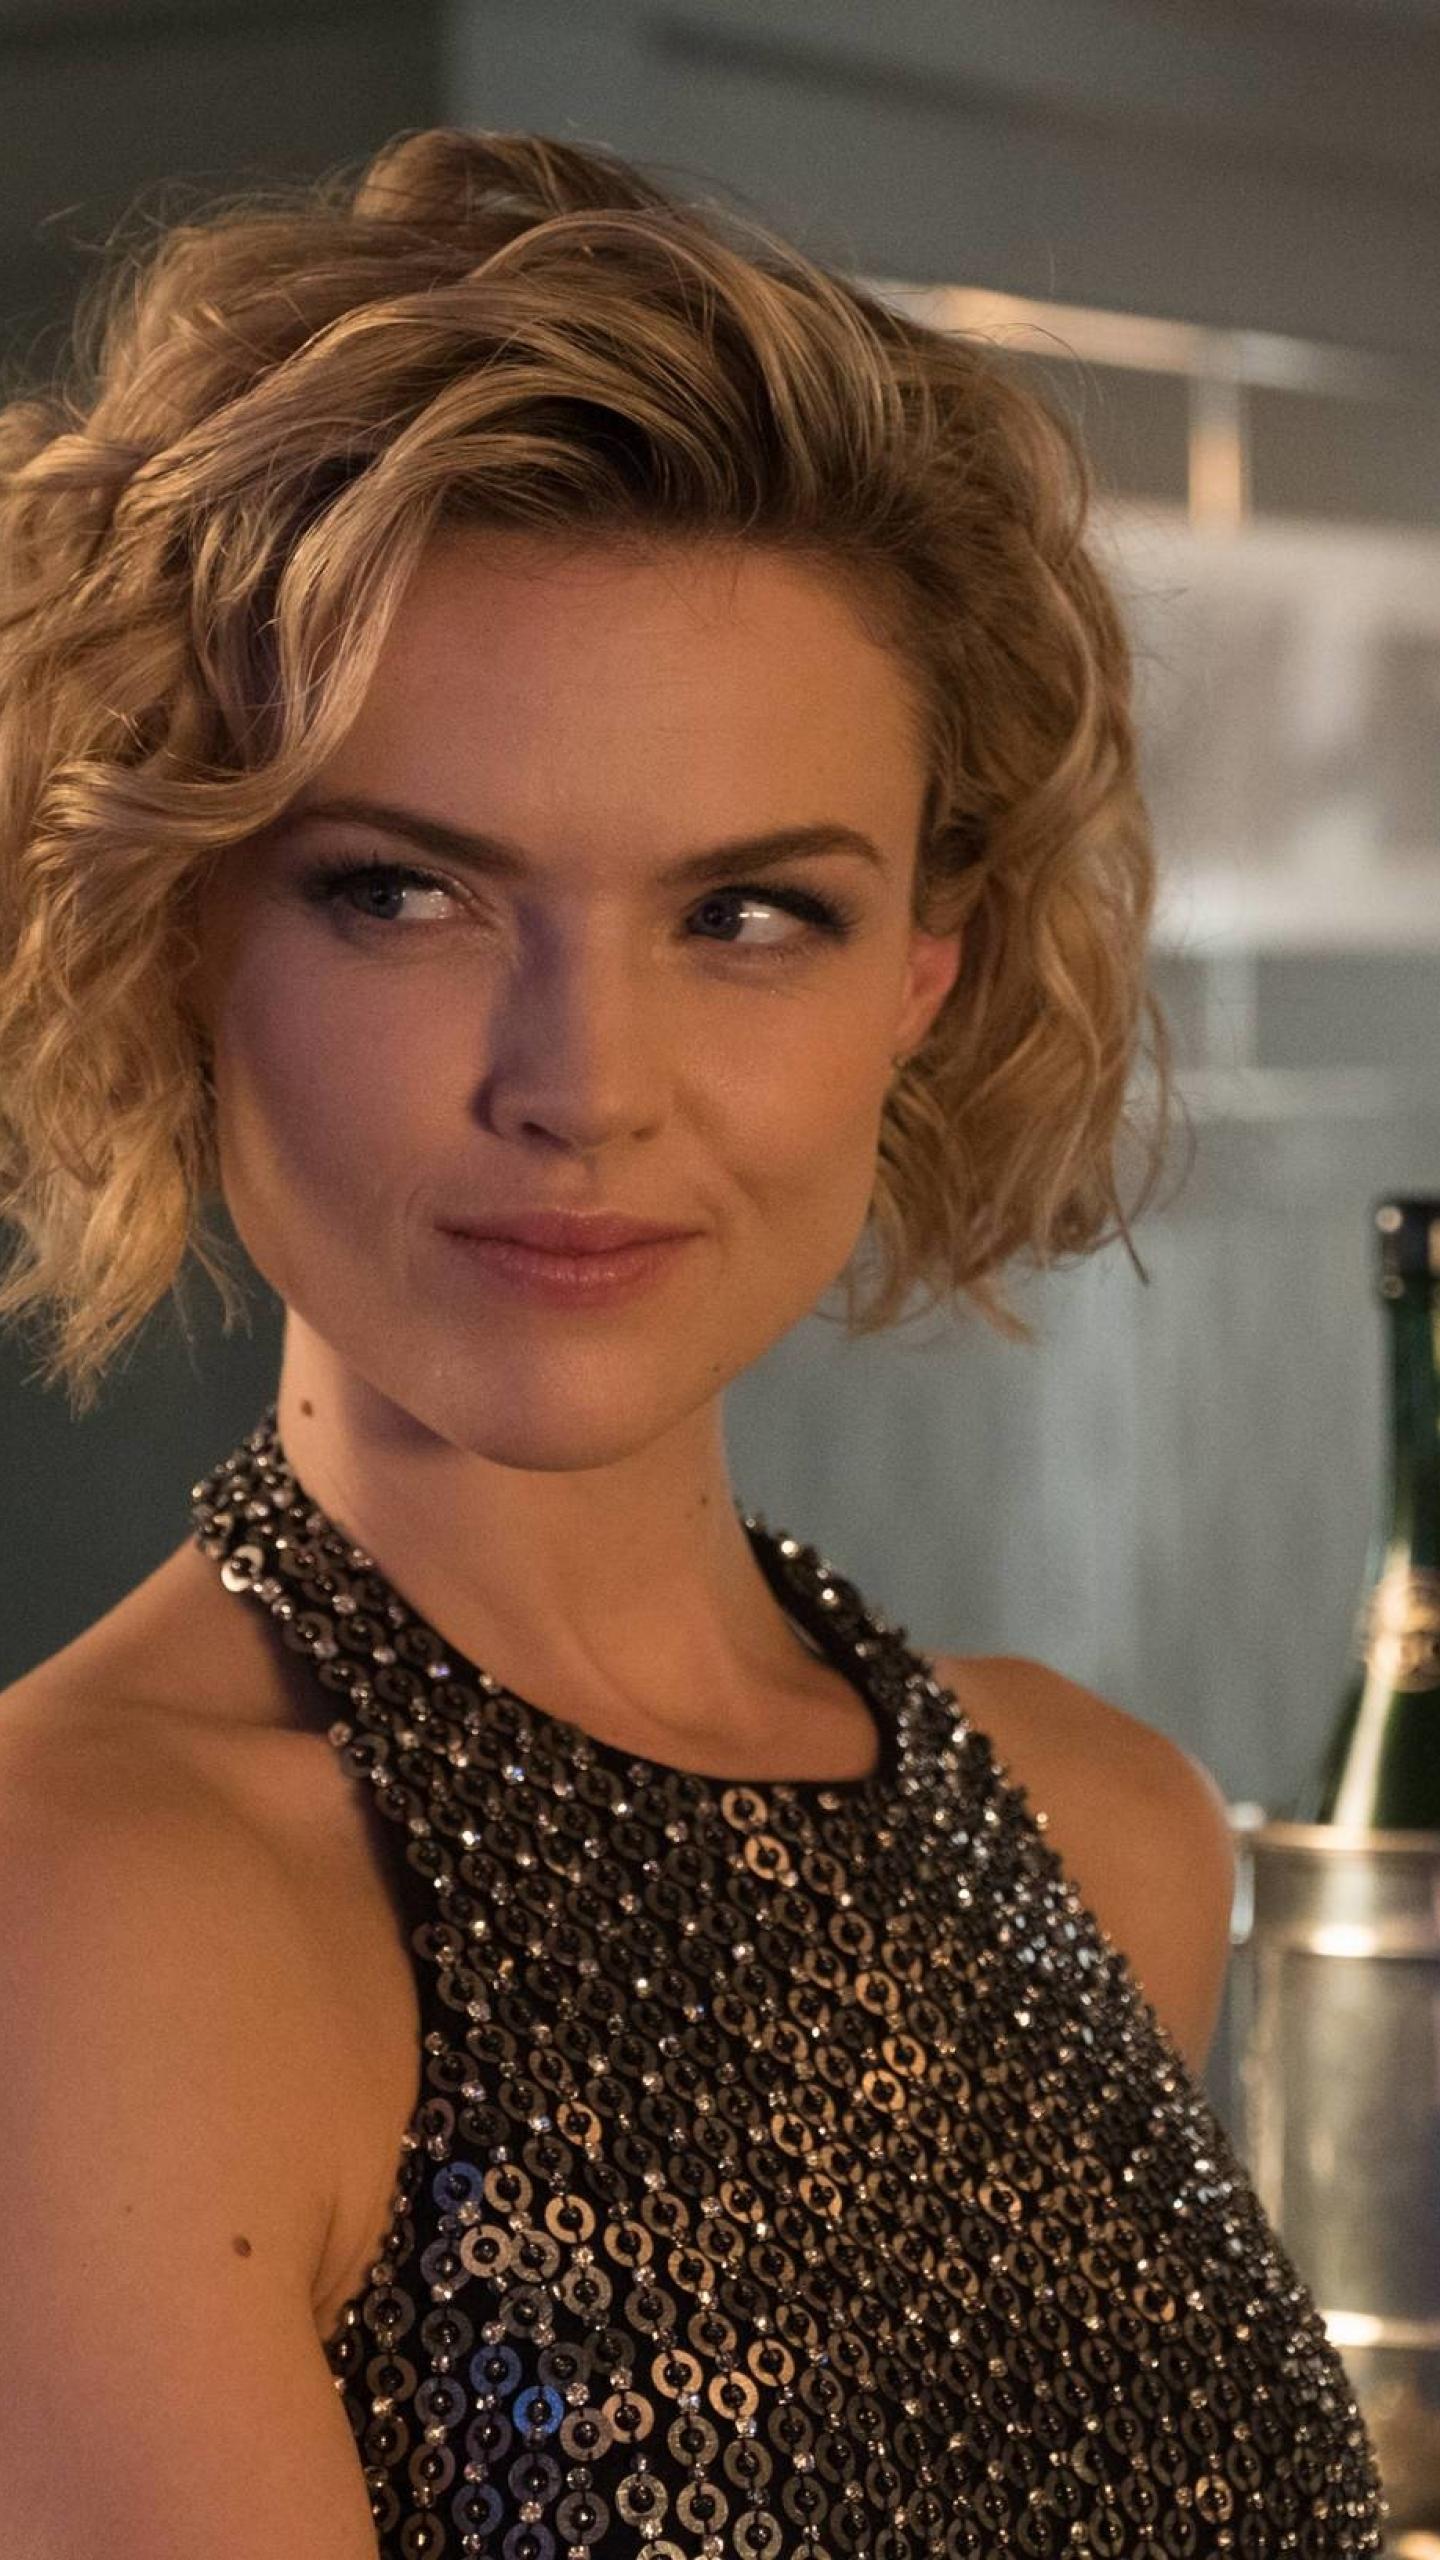 Barbara Kean-Gordon From Gotham Season 4, Full Hd 2K Wallpaper-6643